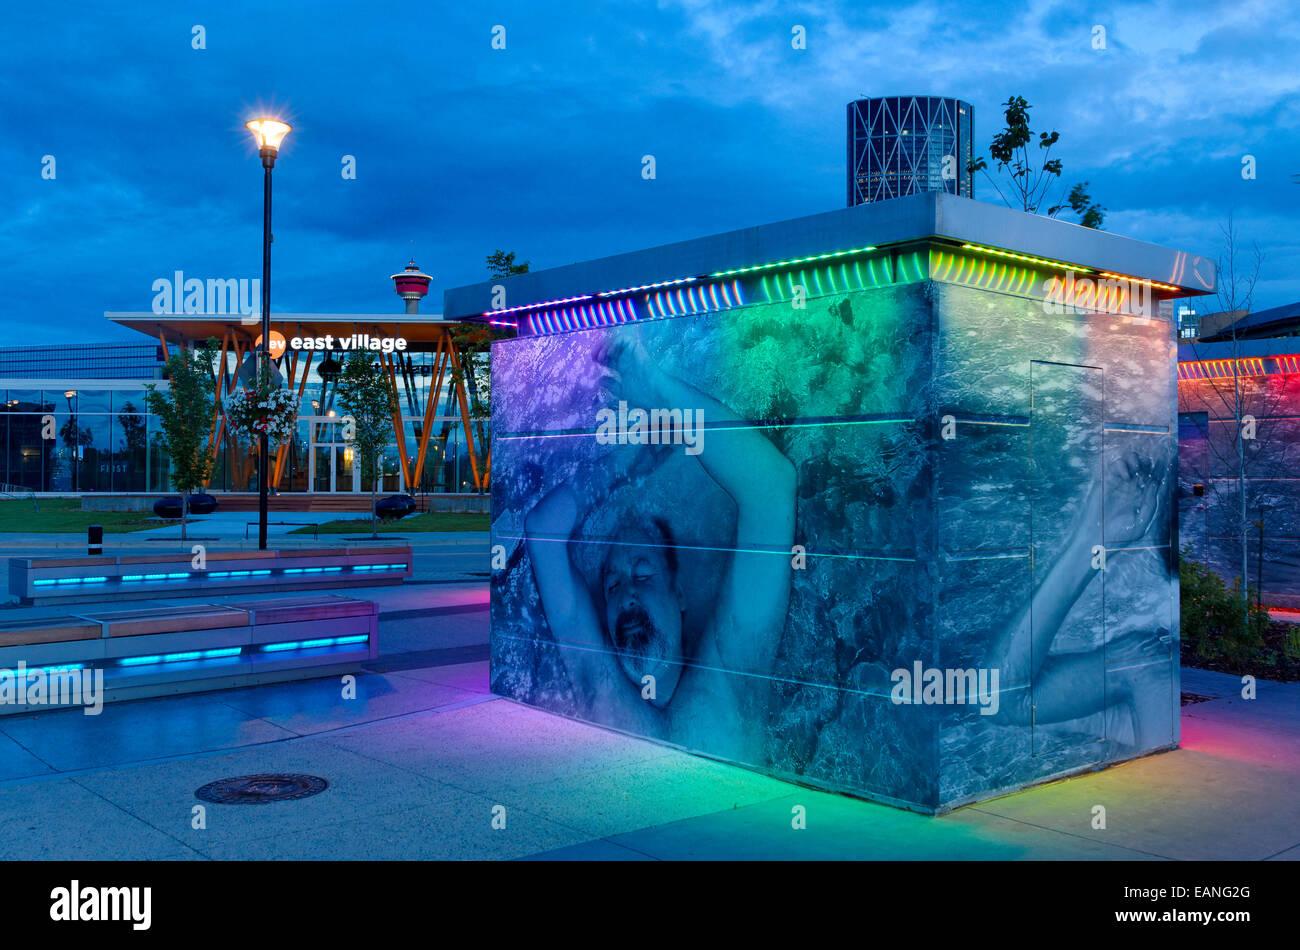 Arty, controversé, high tech les toilettes publiques, East Village, Calgary, Alberta, Canada Photo Stock